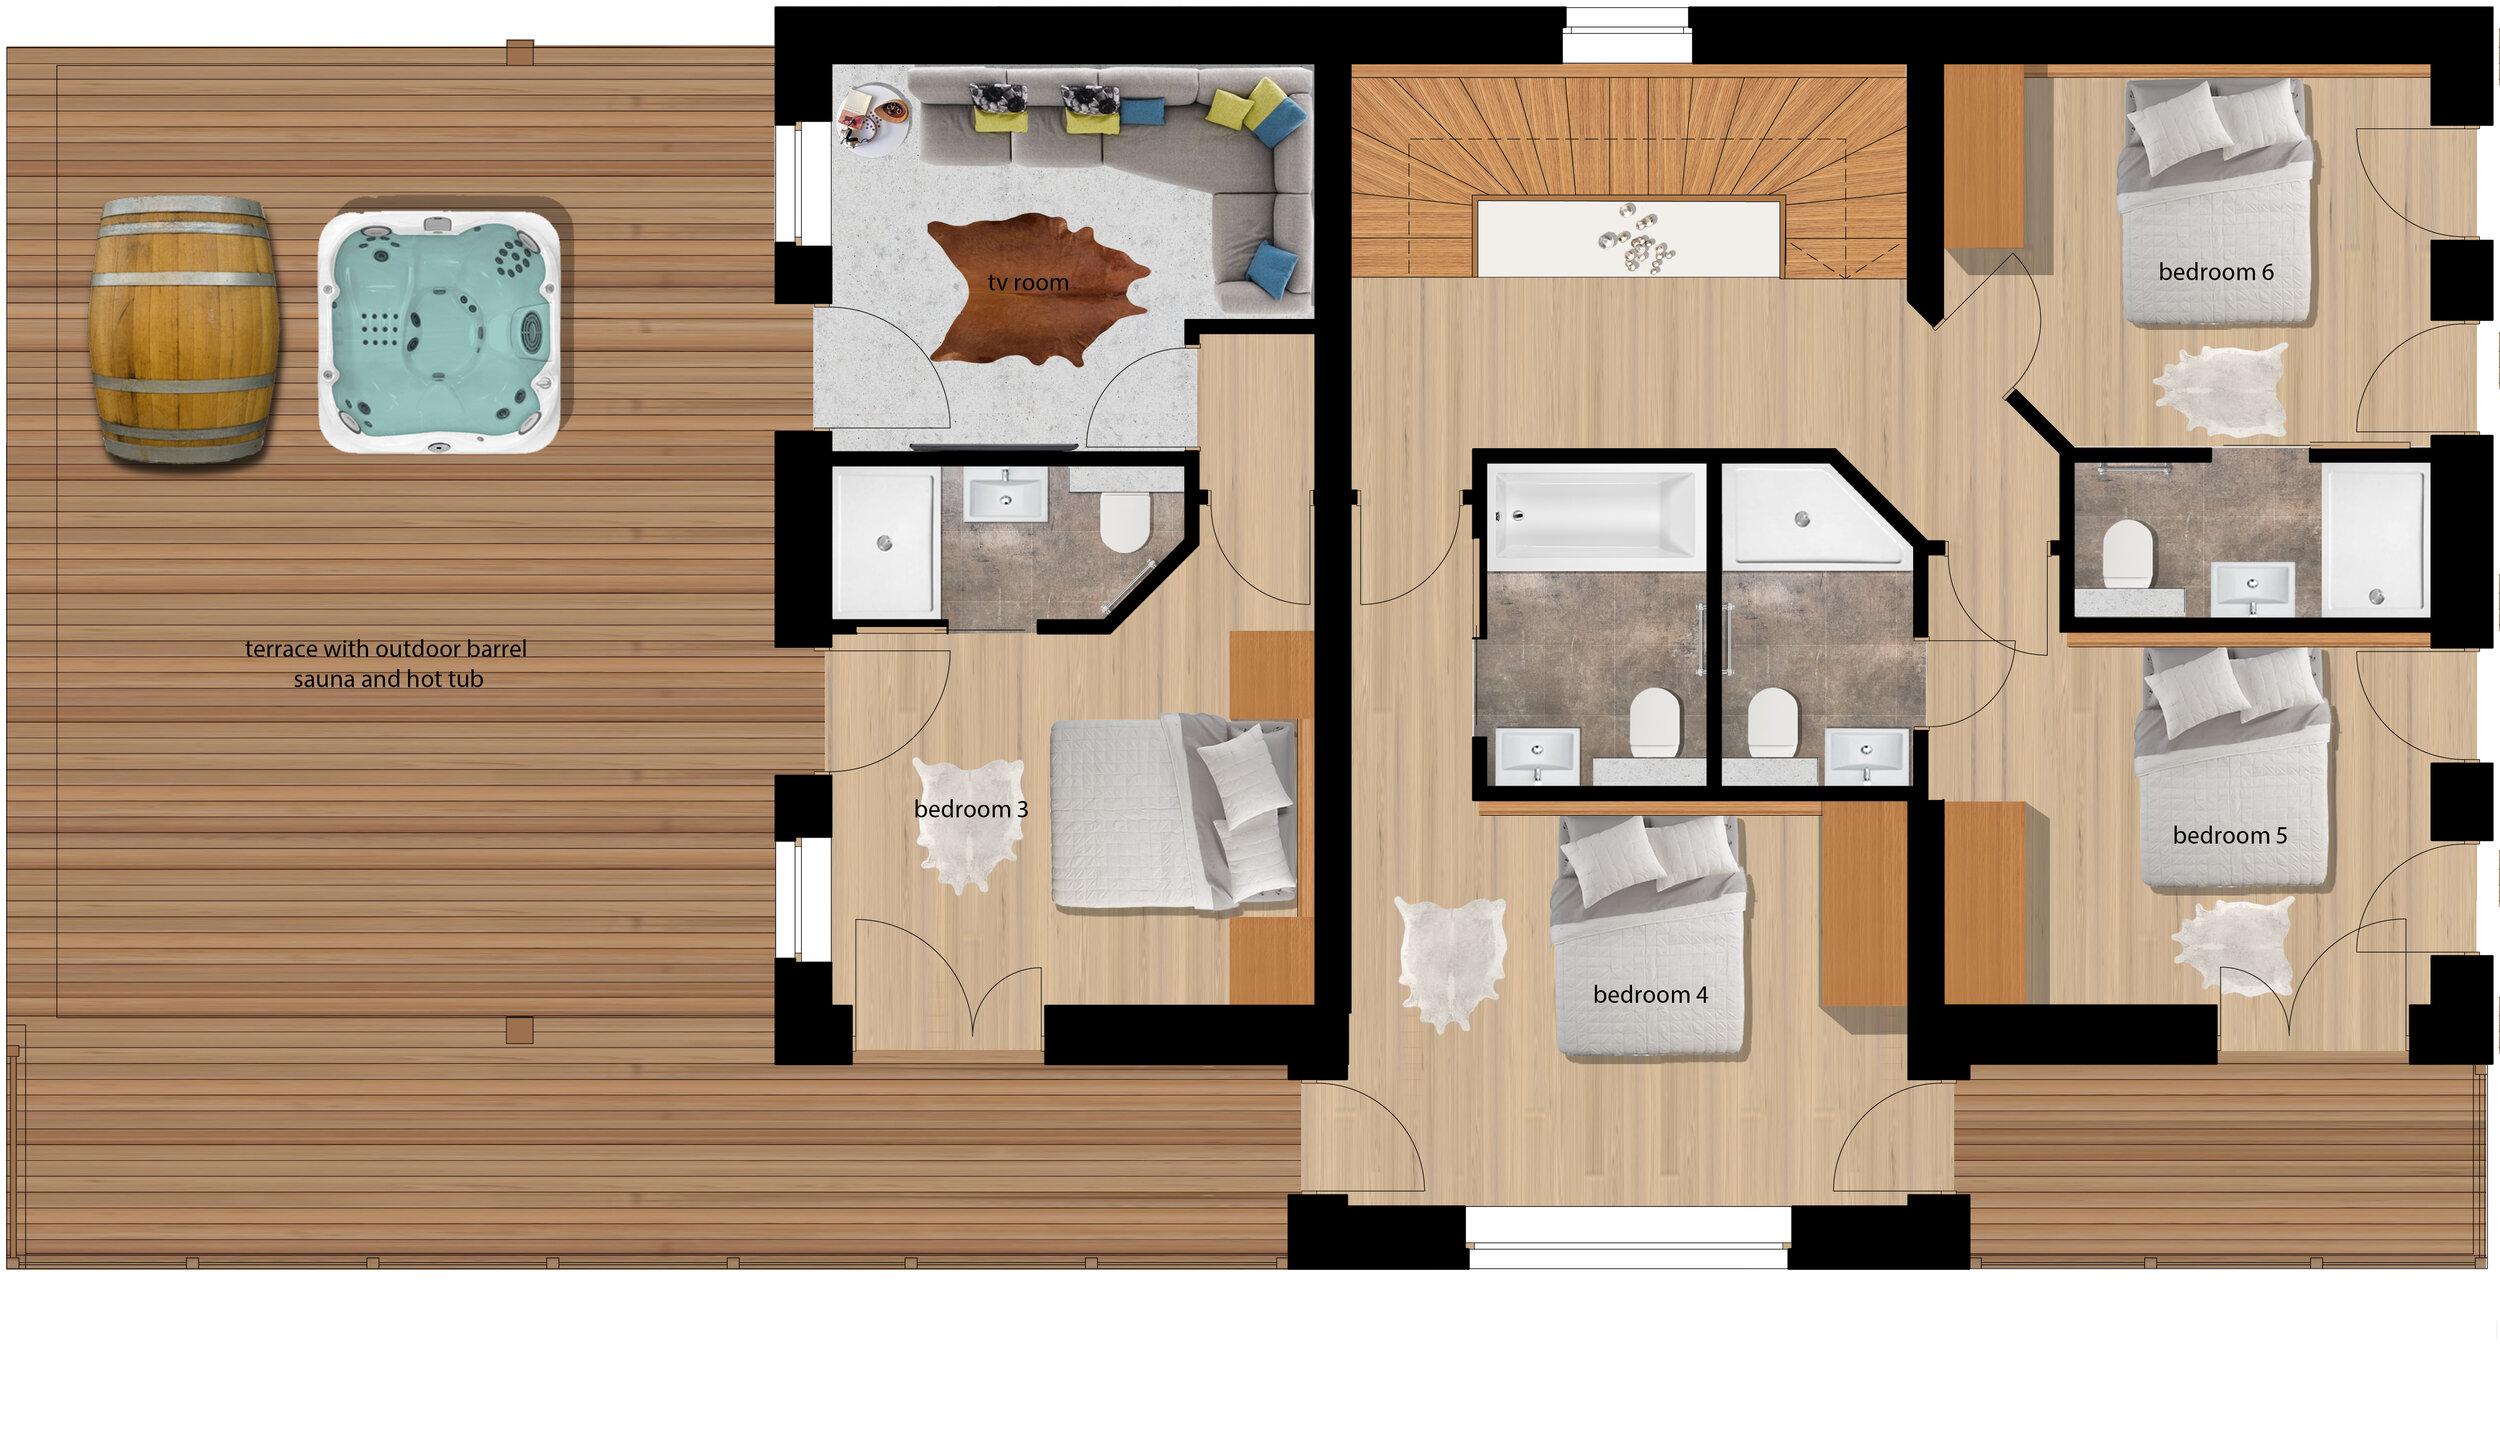 Marketing Floor Plans Arc74 Architectural Services